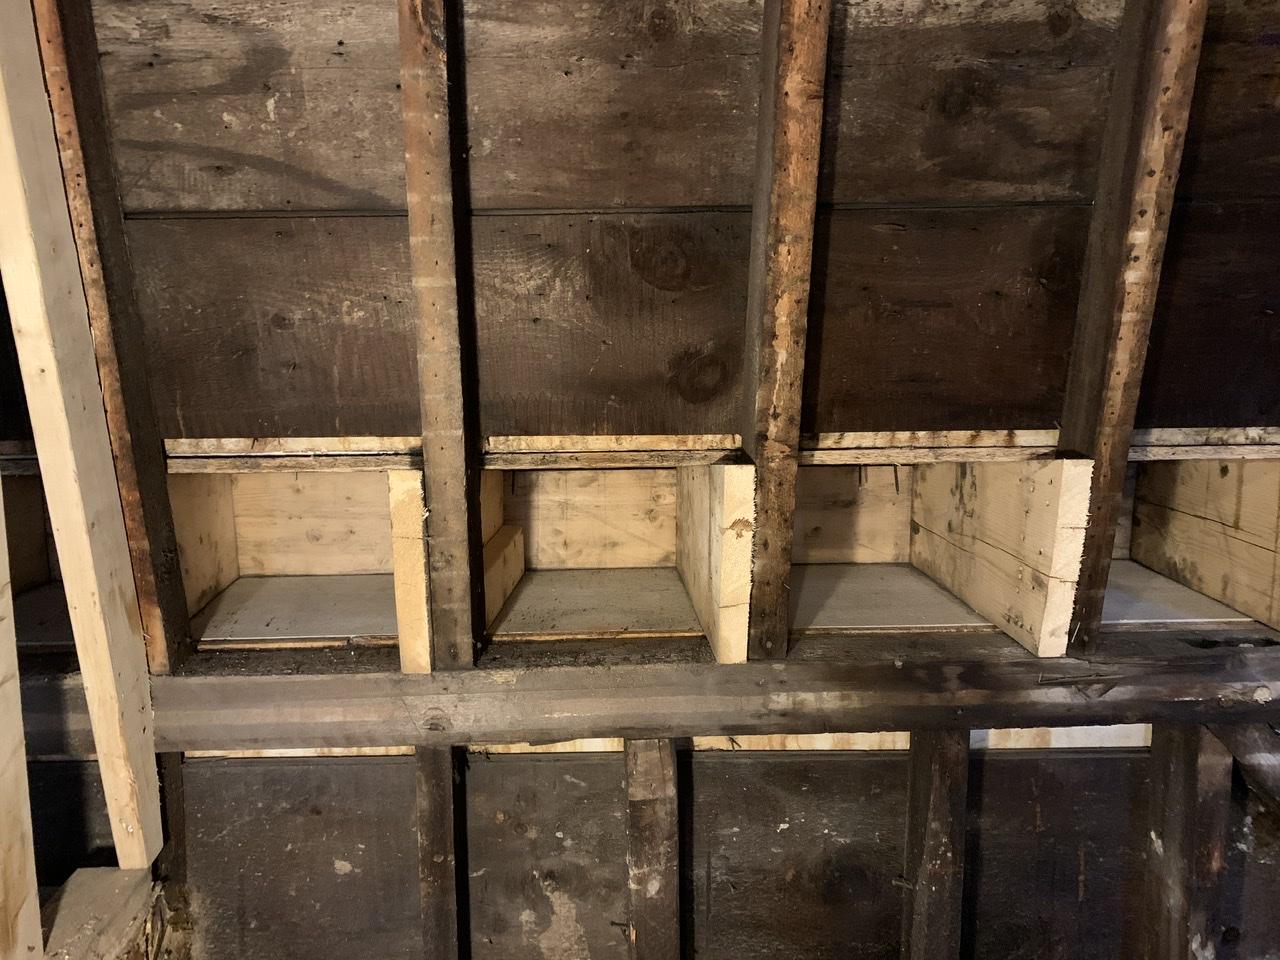 Sealing up Mansard Roof Eaves to create thermal break-648d50f4-9ada-45f5-b0f5-3e0fd3492227_1581429753339.jpeg